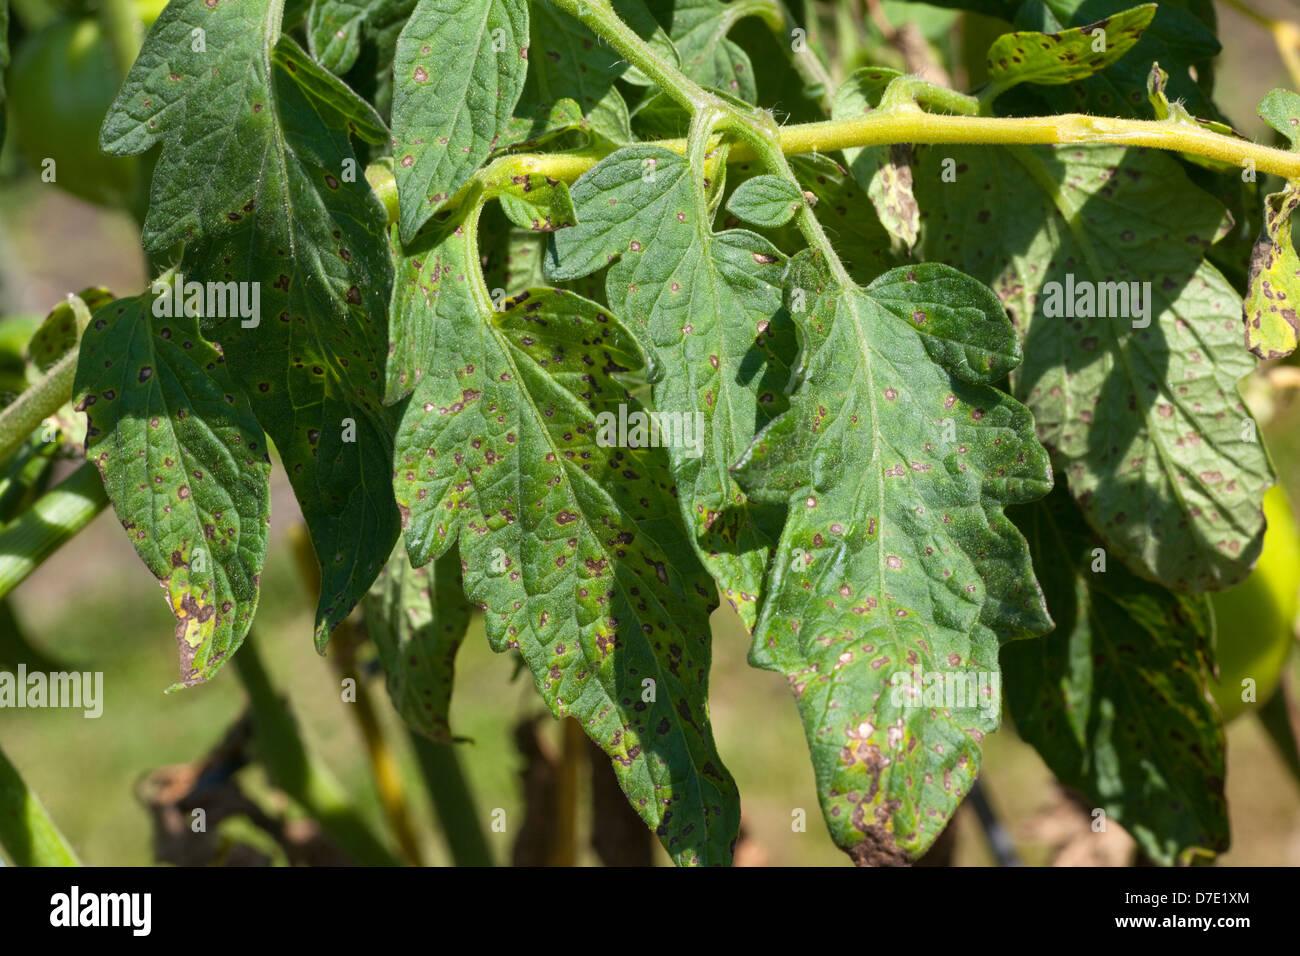 Tomaten-Krankheit, Septoria-Blattflecken Stockbild